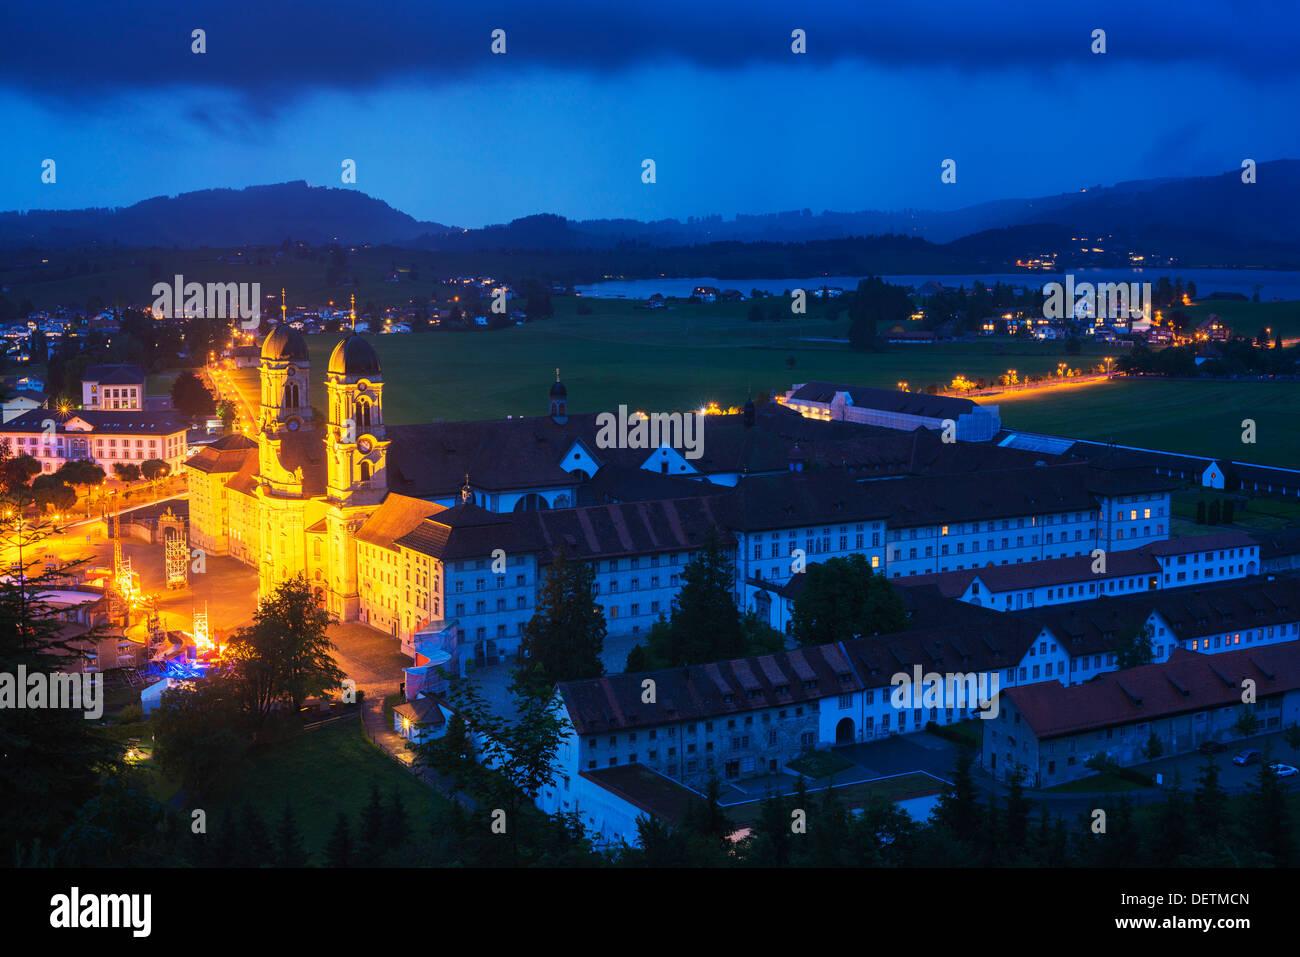 Europe, Switzerland, Einseideln, Klosterkirche monastery, baroque style facade - Stock Image